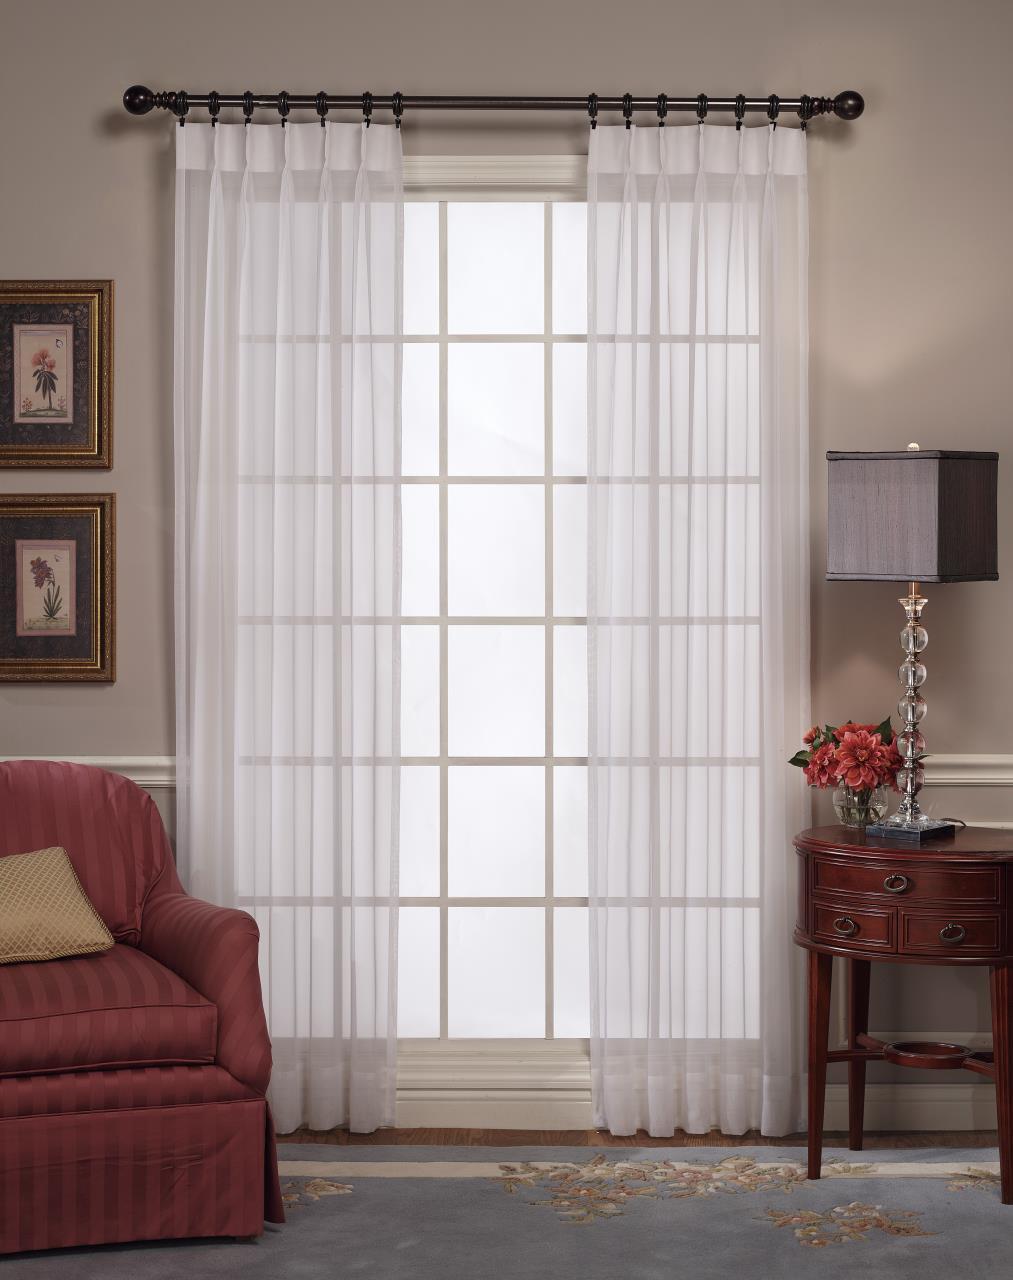 Emelia Pinch Pleat Lace Curtain - #REF!